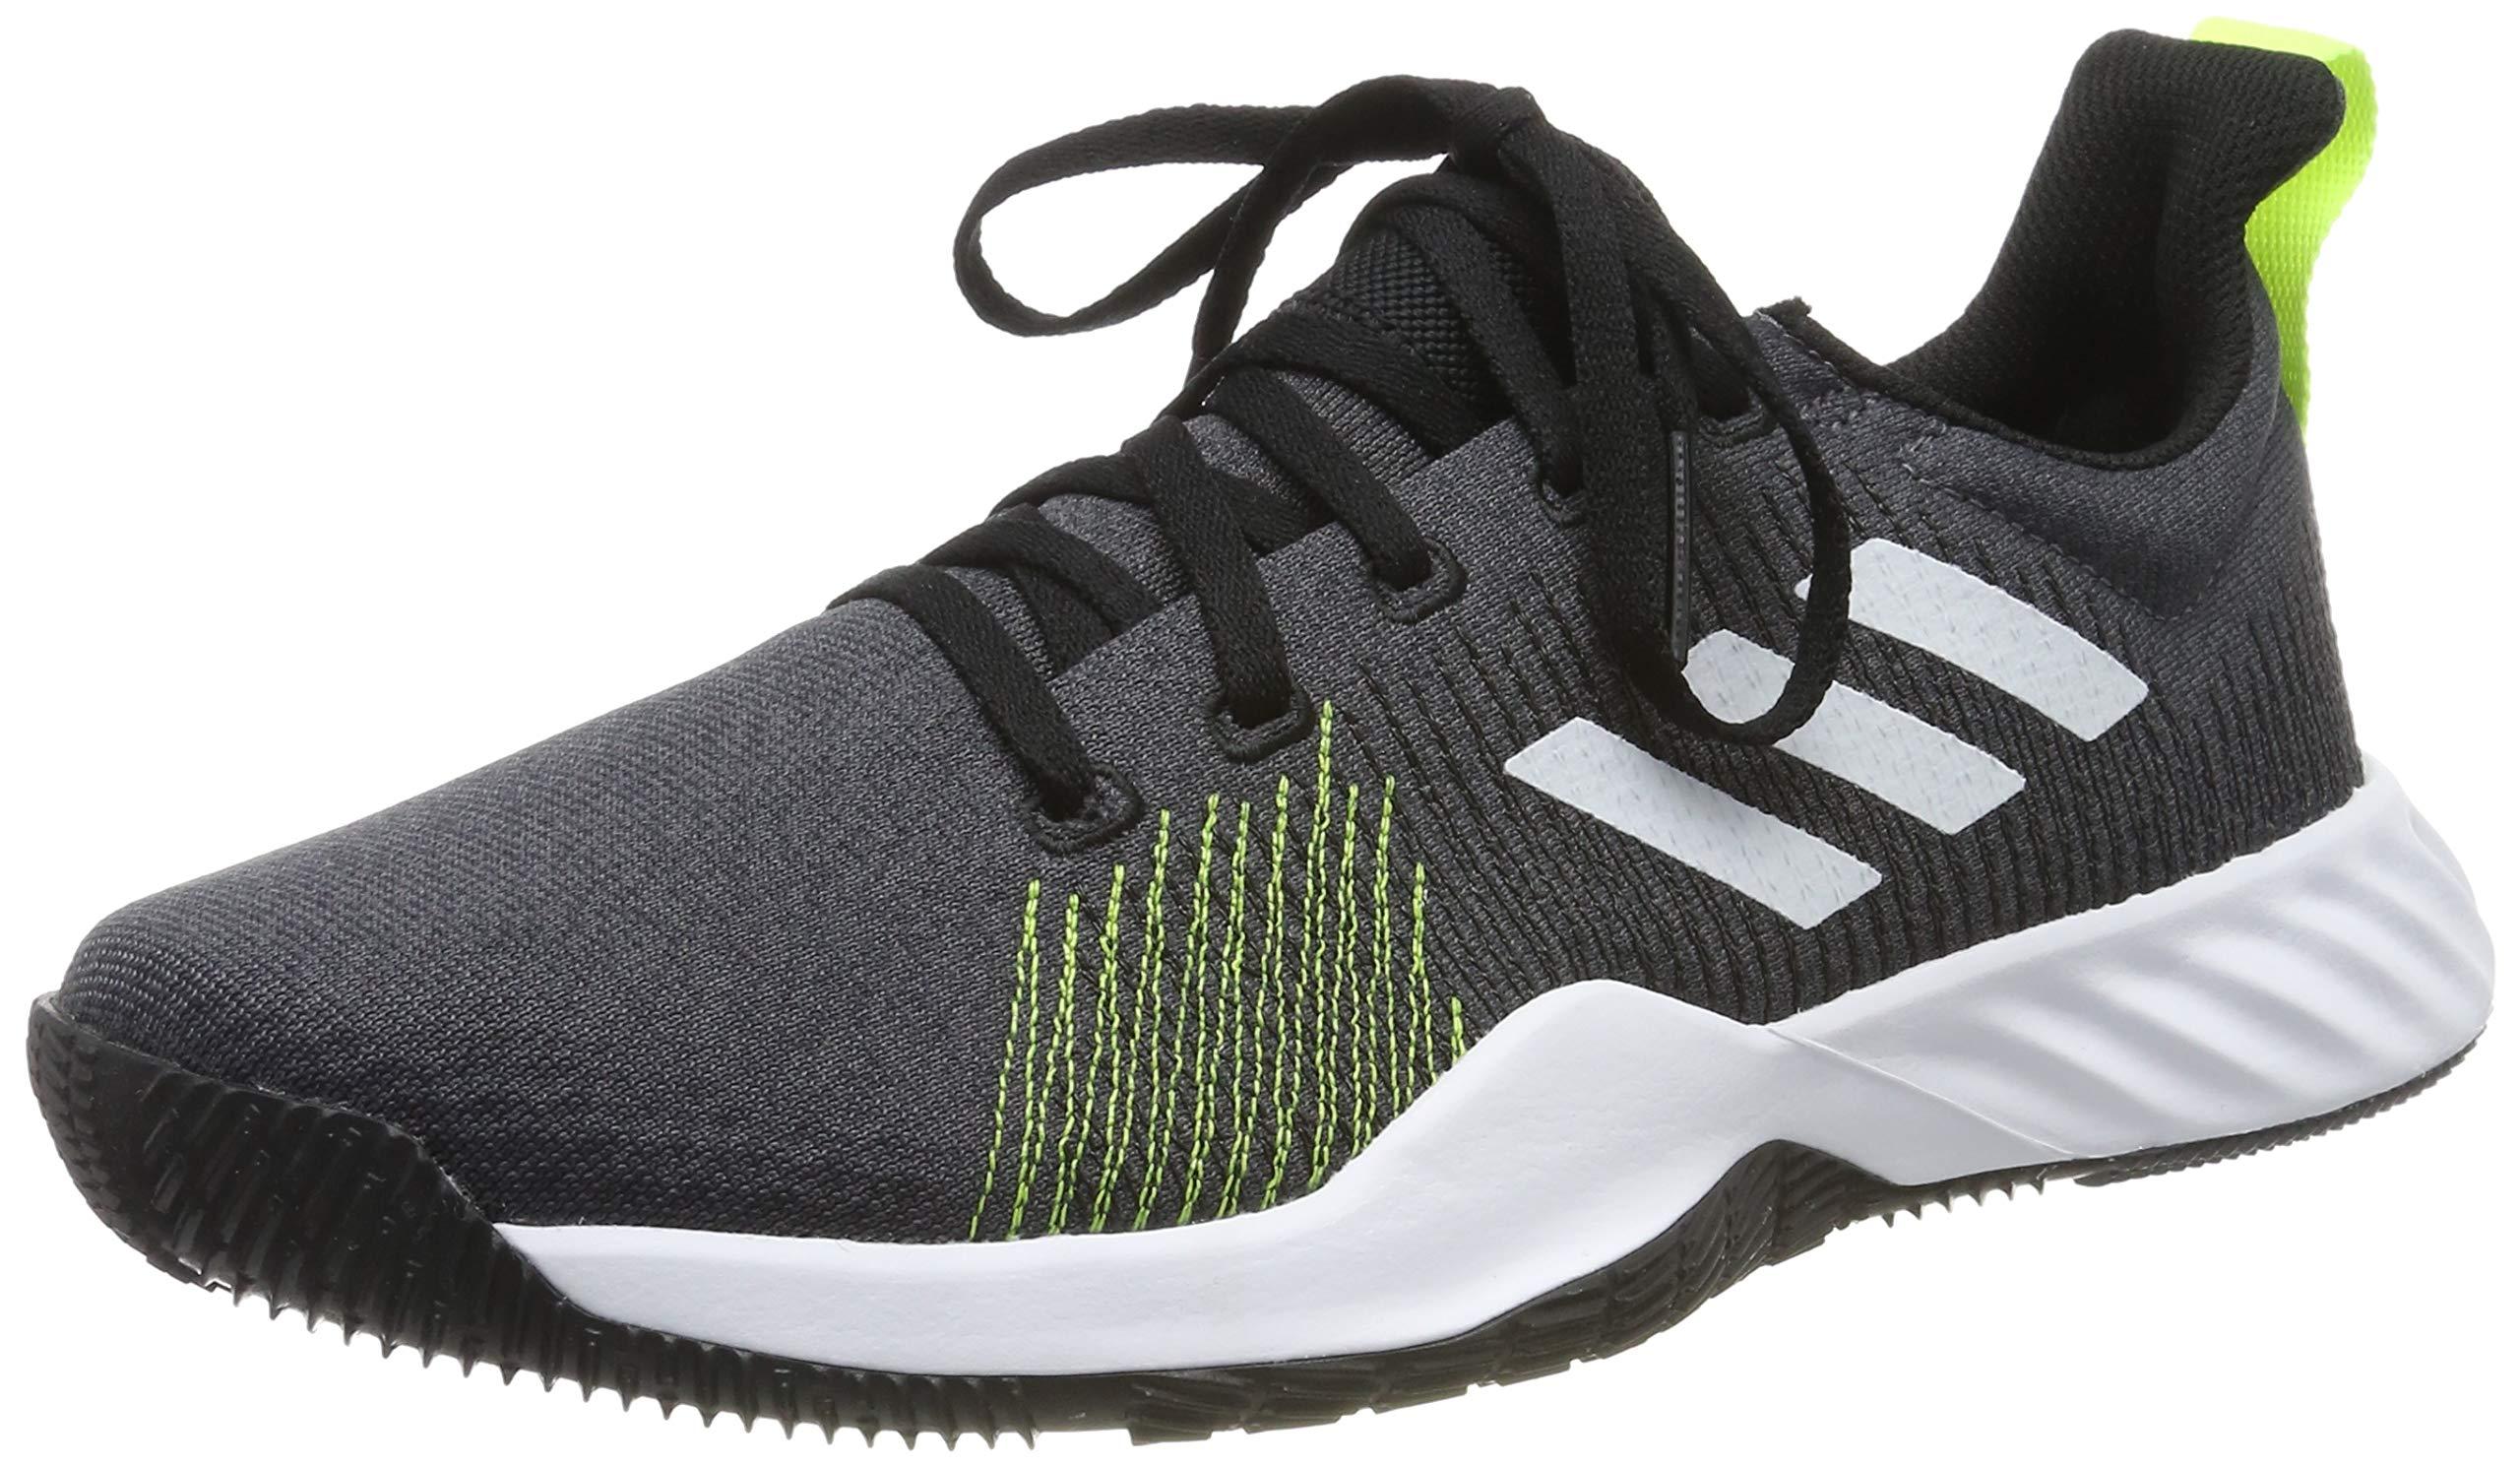 Adidas Running Eu M MChaussures De Bb723640 Lt HommeMulticolorecblack ftwwht Solar hireye Trainer qc4A35RjLS